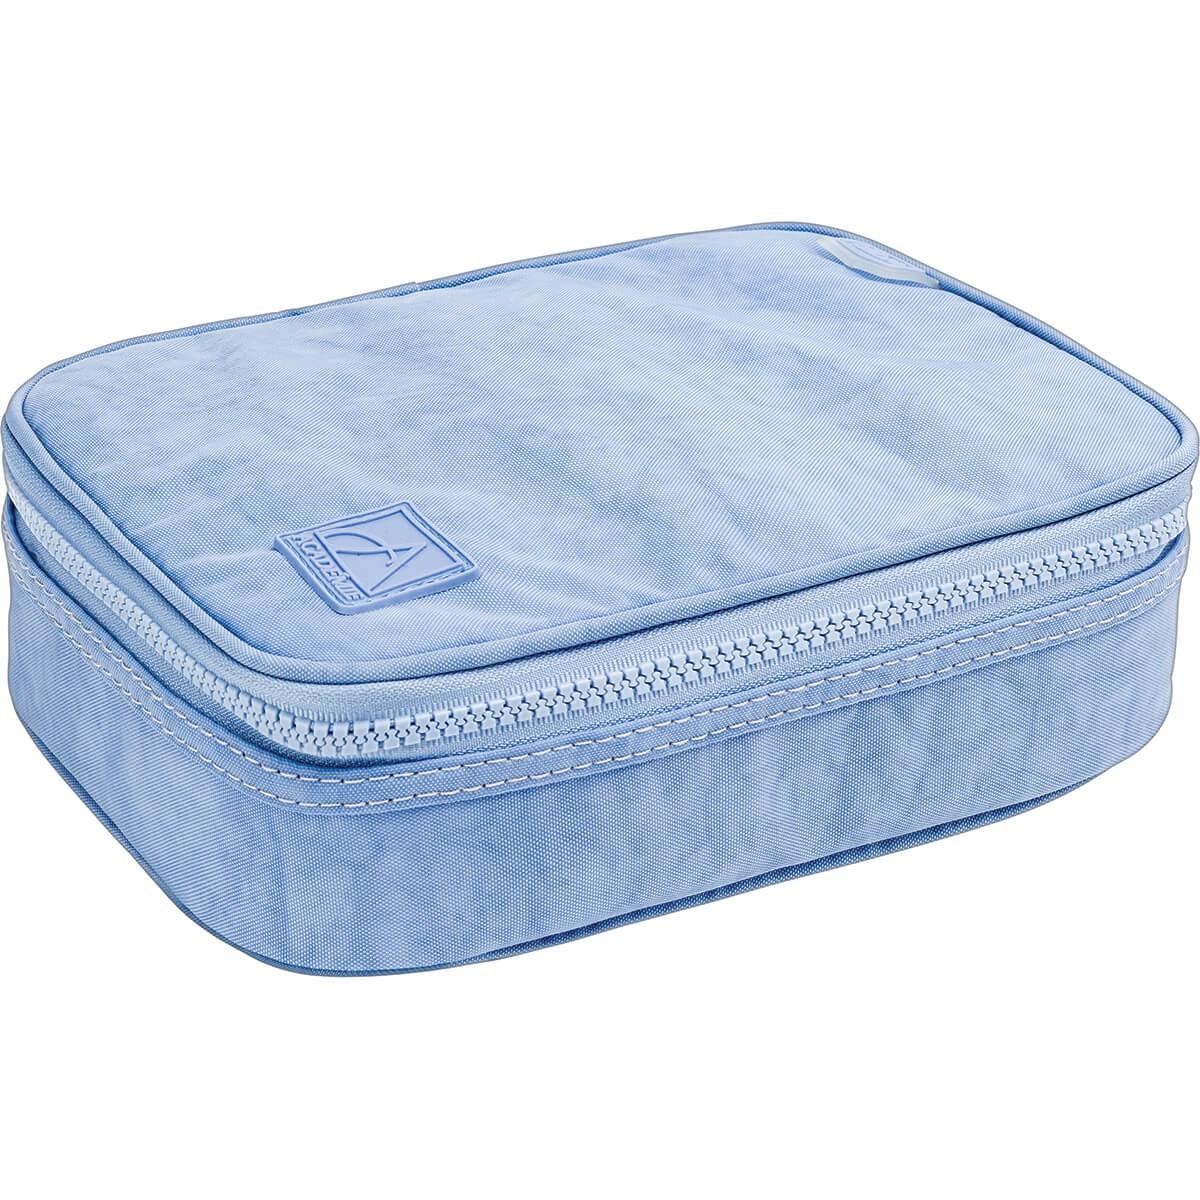 Estojo Box Académie Tilibra - Azul